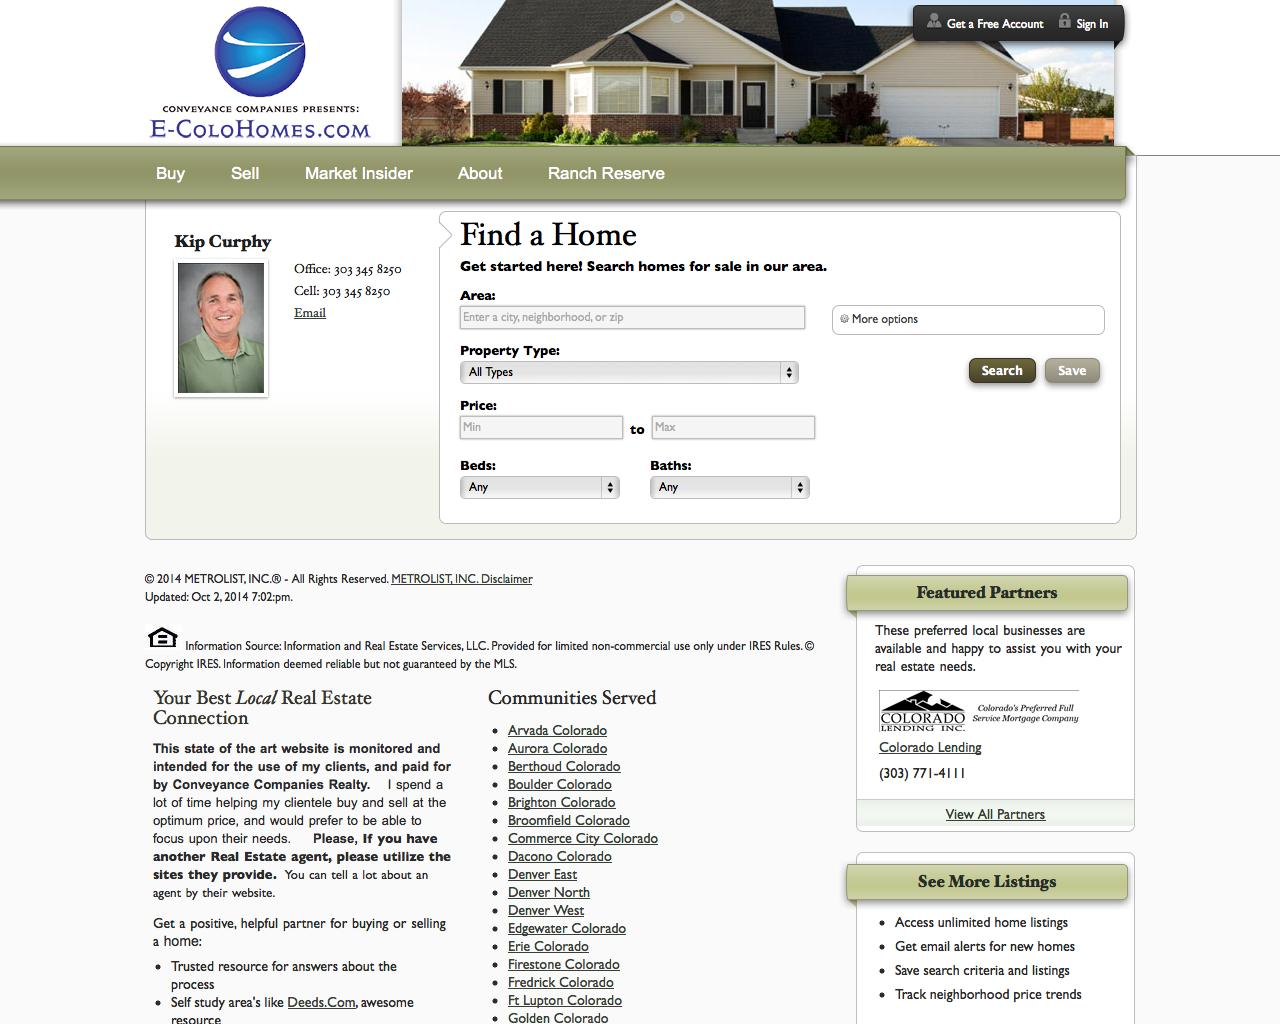 Screenshot of conveyanceco.com - Denver and the Front Range Homes for Sale - captured Oct. 3, 2014